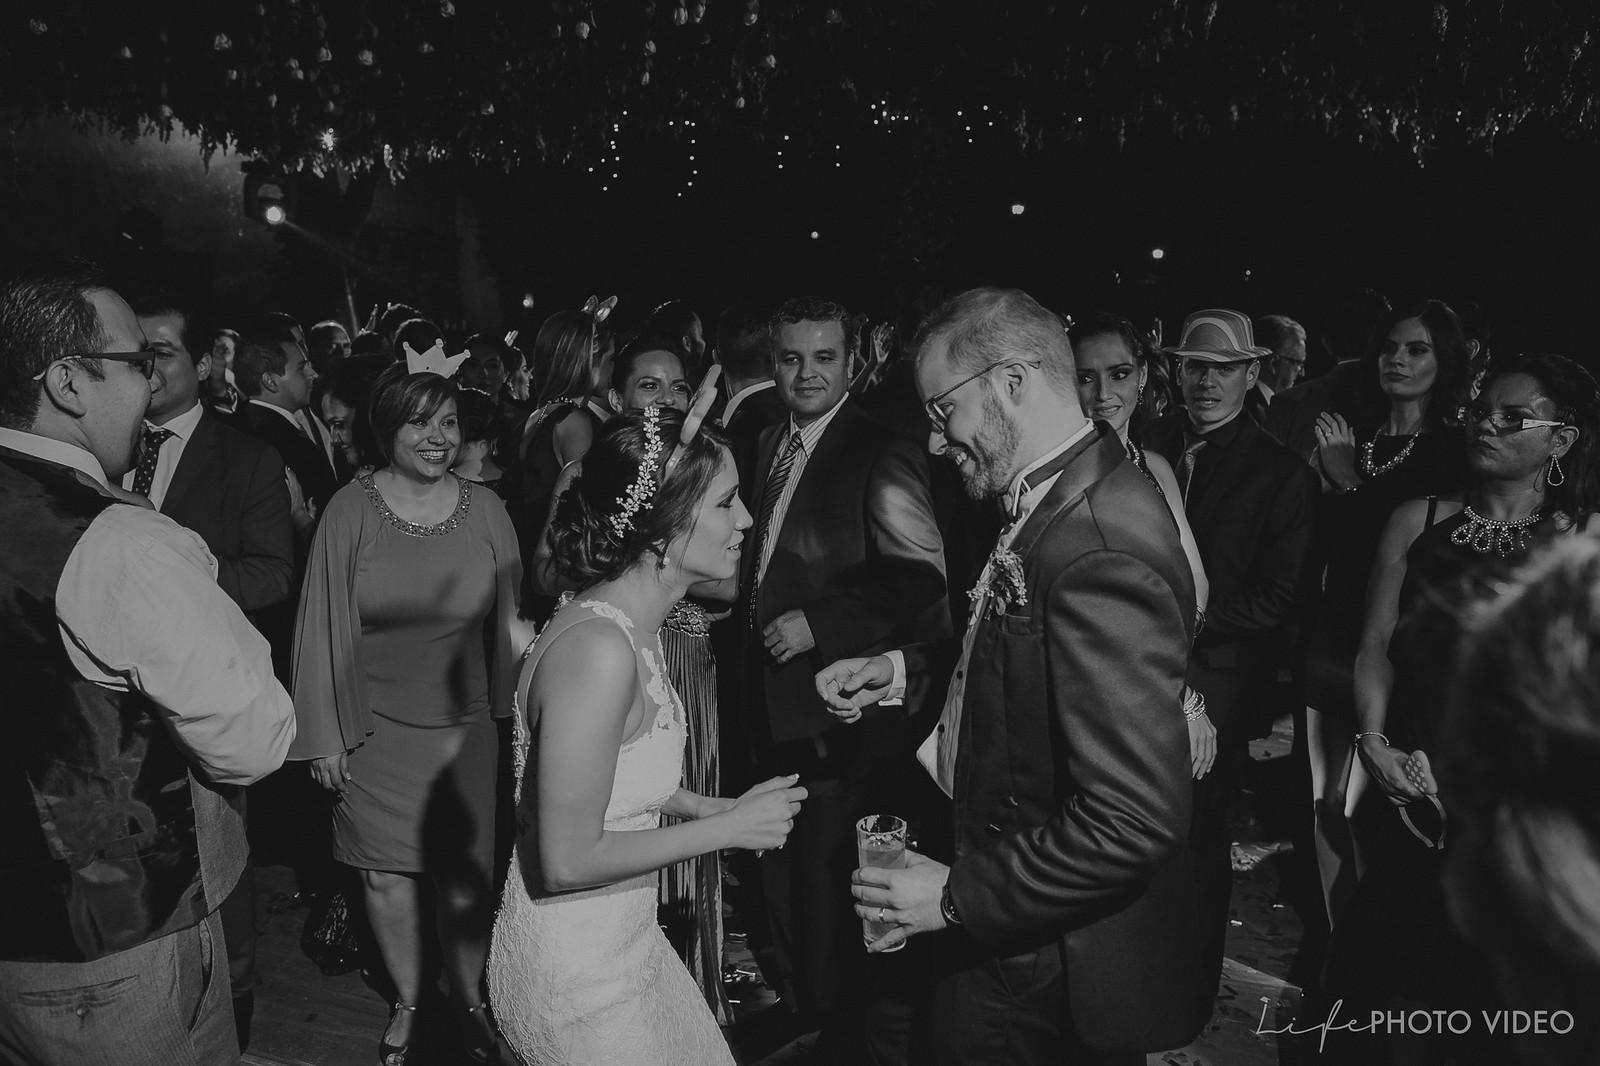 LifePhotoVideo_Boda_Guanajuato_Wedding_0072